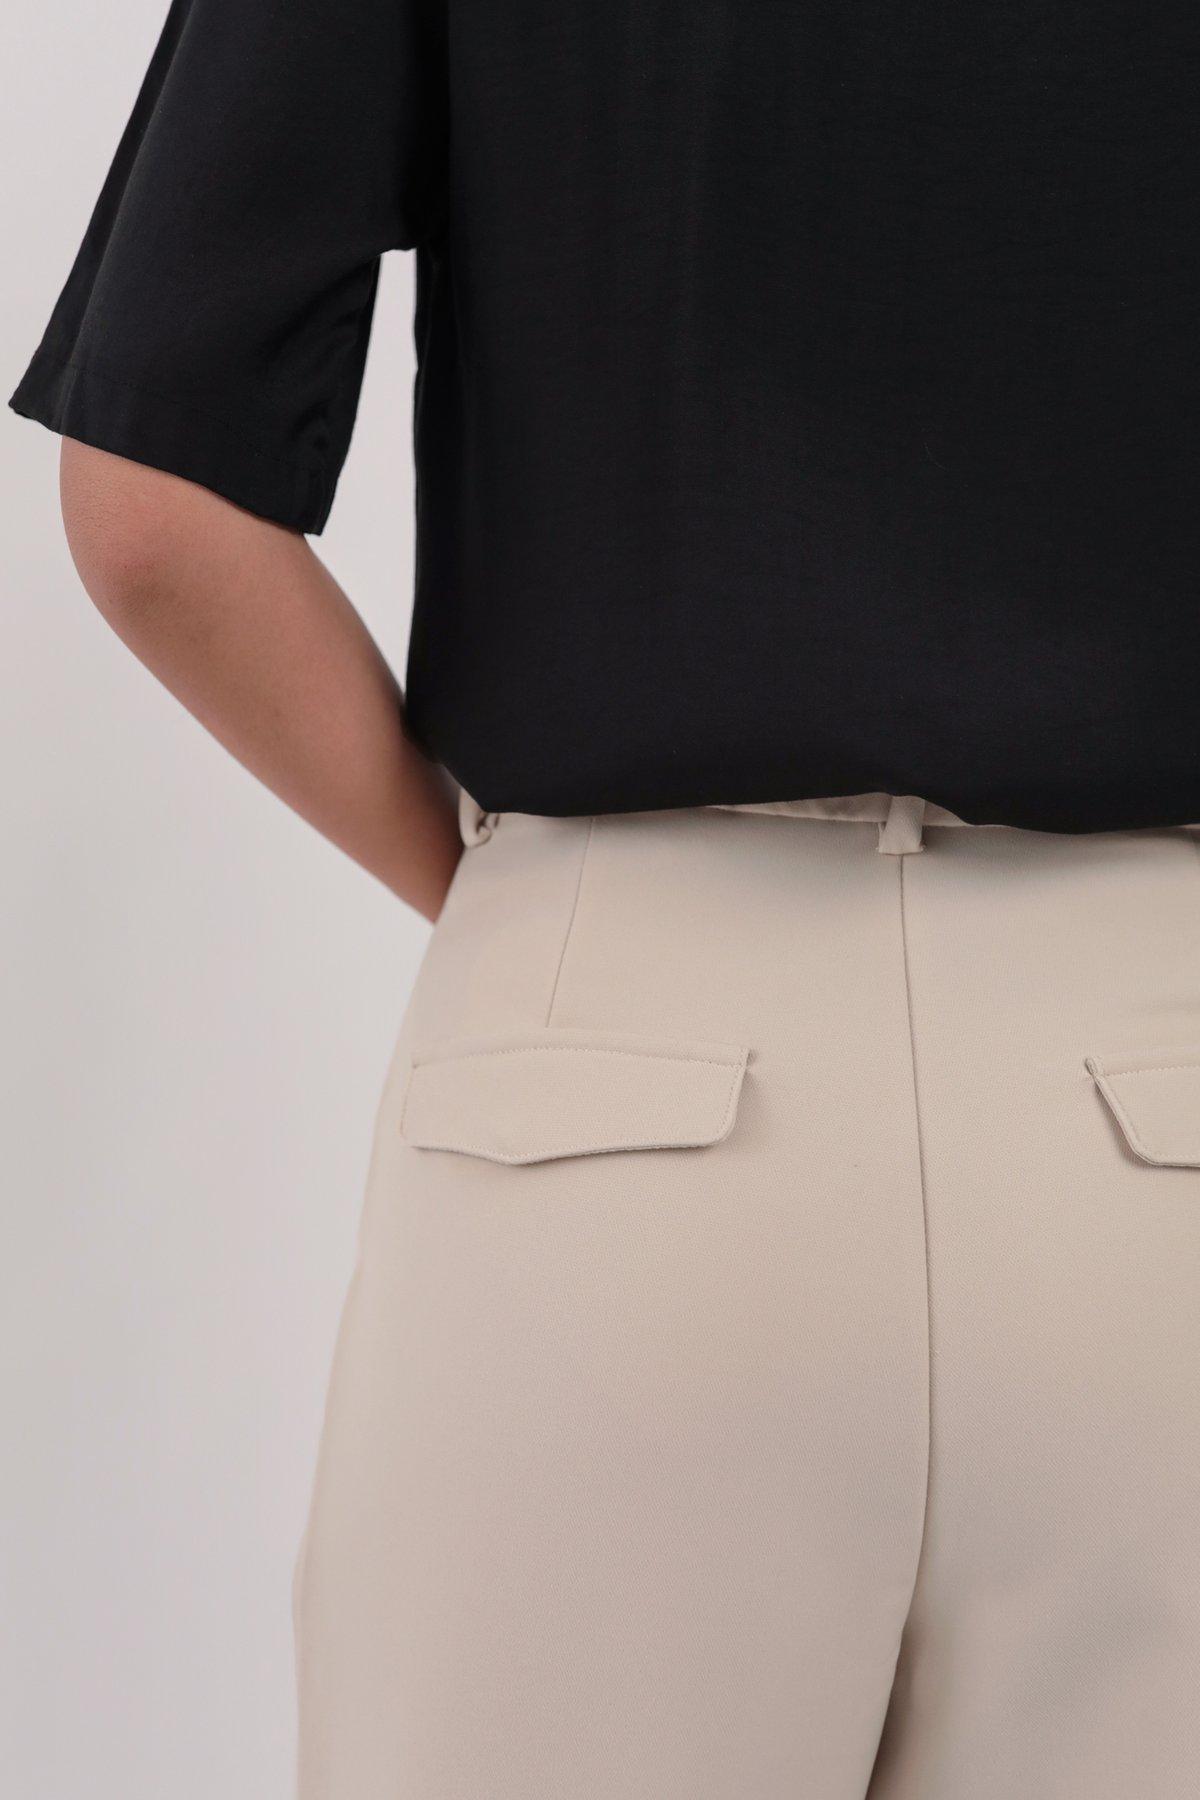 Baxter Cuffed Pants (Beige)